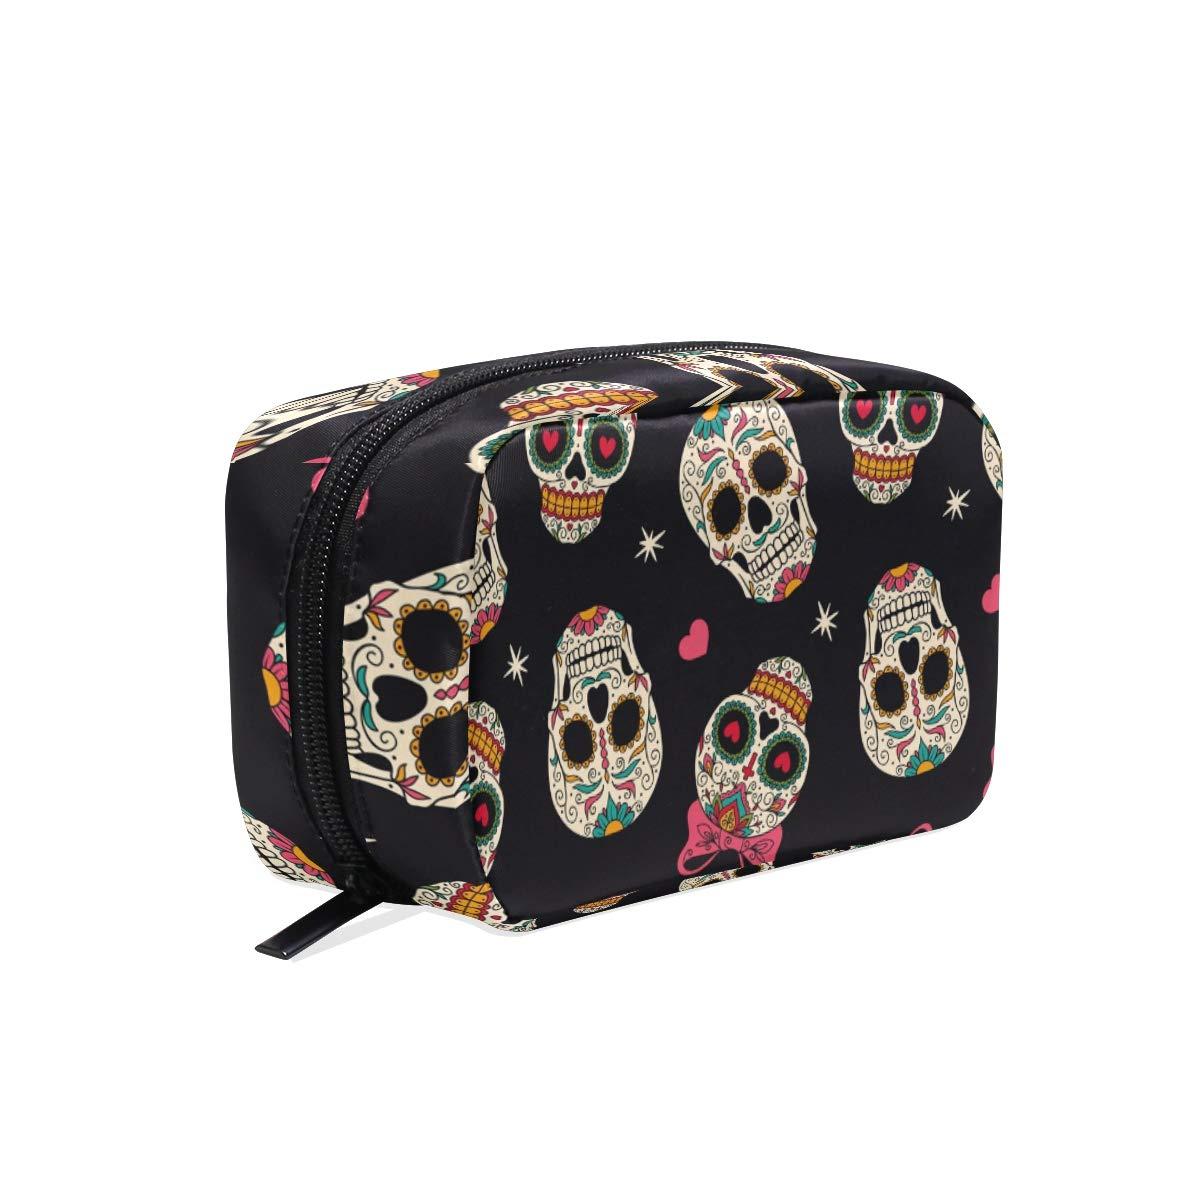 Toiletry Bag Sugar Skull Cosmetic Bag Portable Makeup Bag Pouch Travel Hanging Organizer Bag for Women Girls(831n)